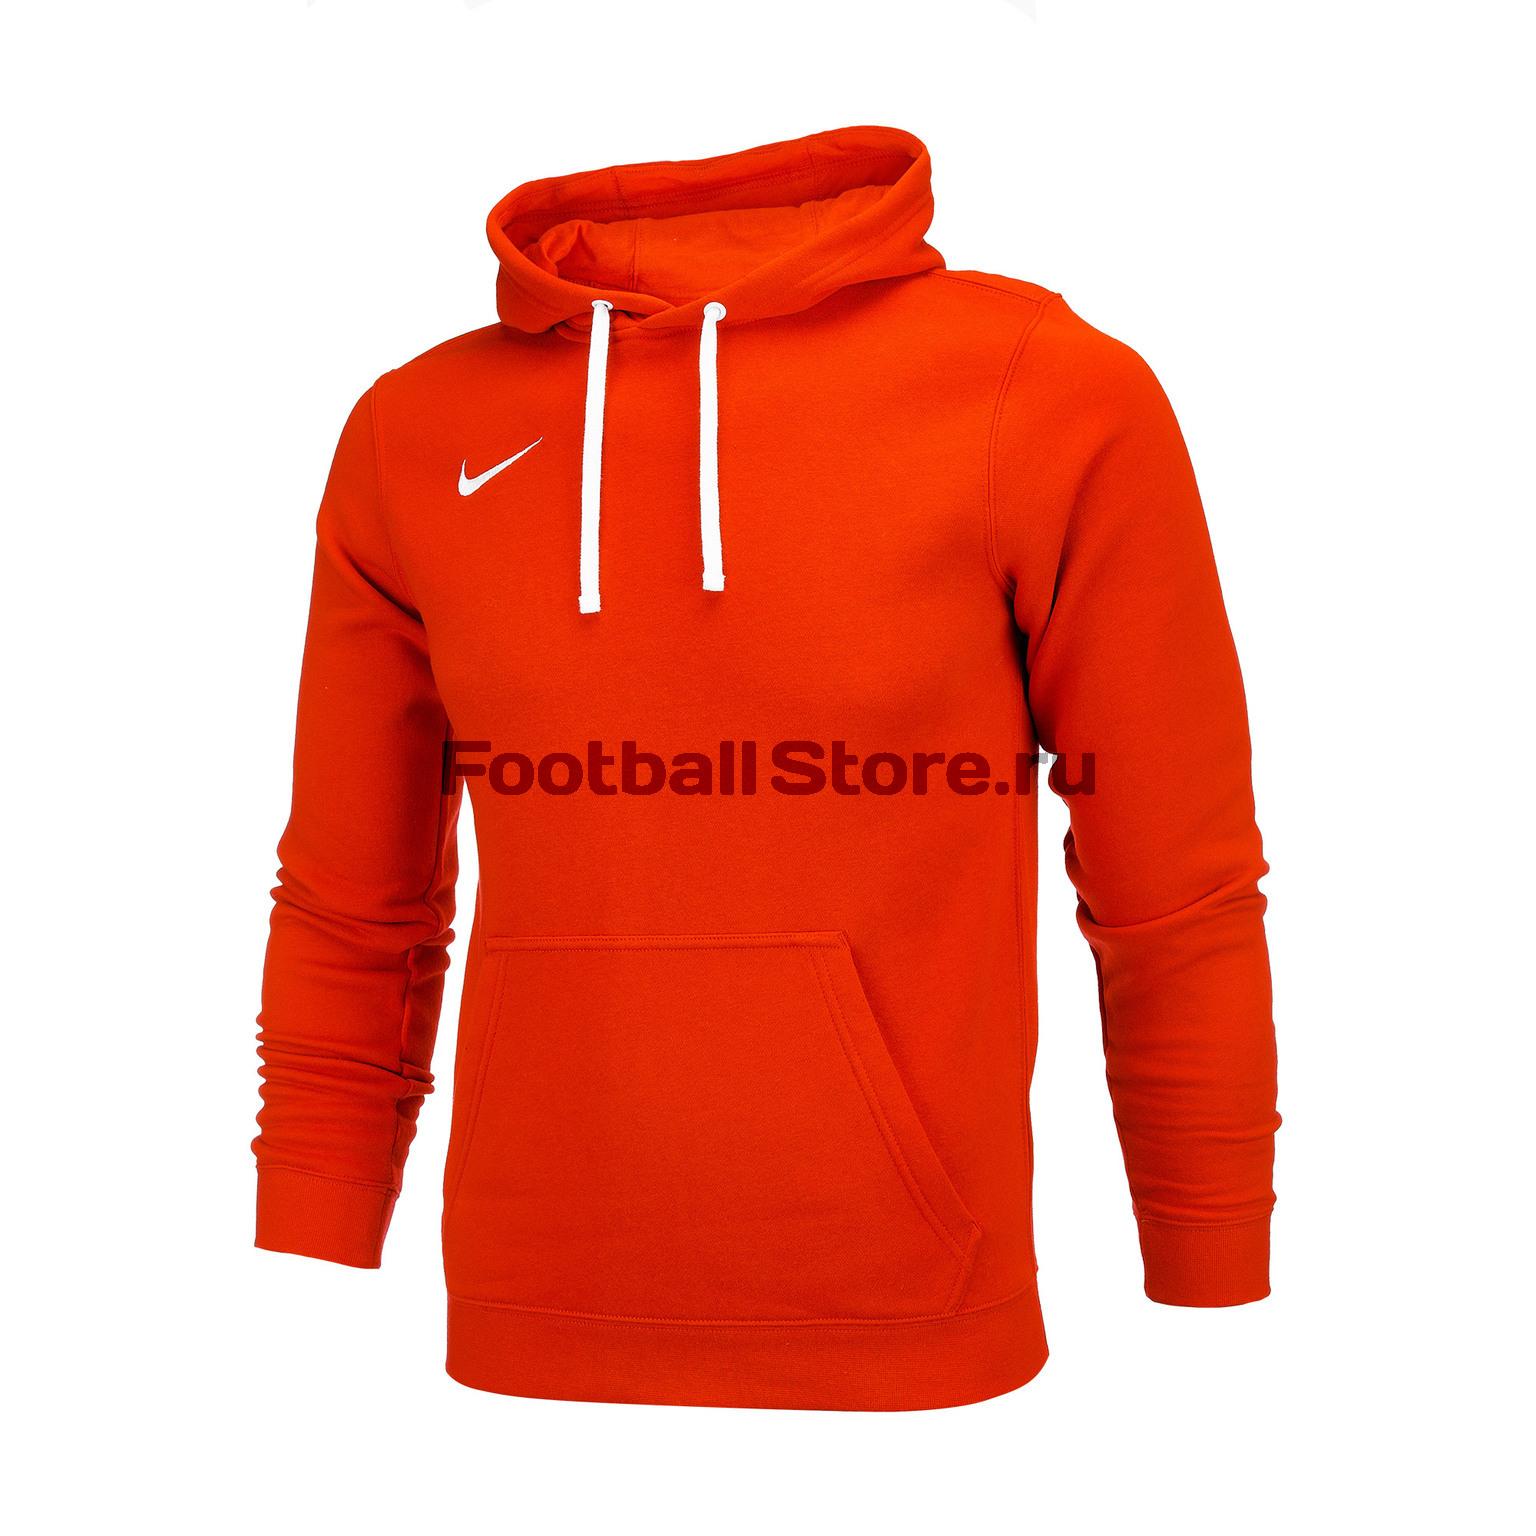 6db2b738 Толстовка Nike Hoodie Po Flc Club19 AR3239-657